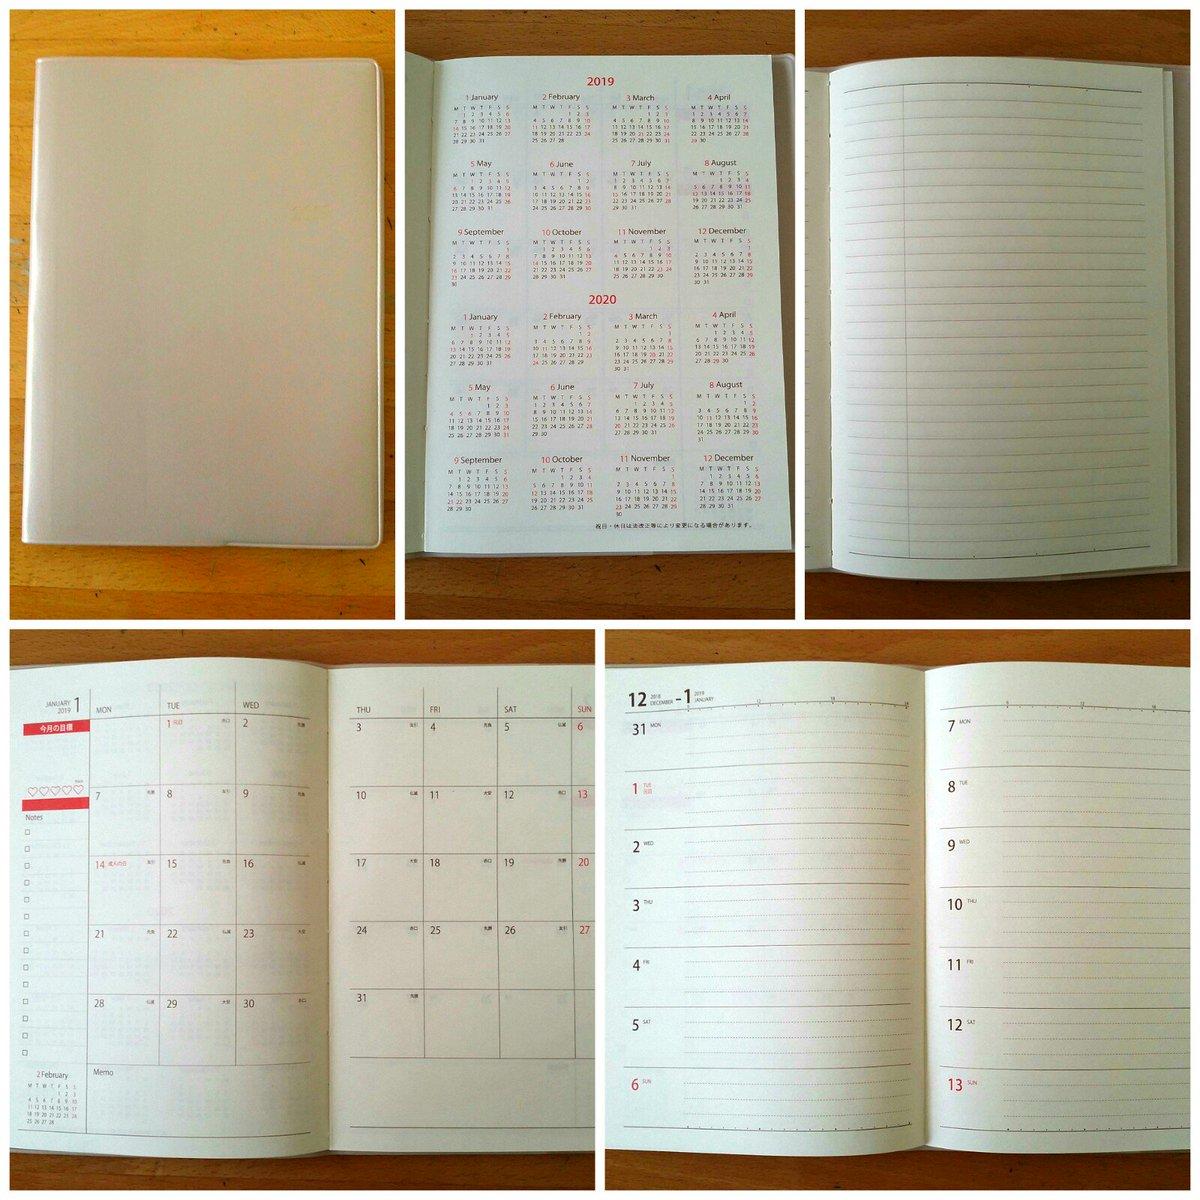 test ツイッターメディア - 持ち歩き用。ほぼ日手帳weeksがほしいけど厳しいから、今年もセリアで購入。2018年版はブロックタイプのバーチカルを買ったけど、重くて持ち歩くのやめちゃった…から見開き2週間で大きさも厚さも重さも軽い手帳を選んでみた!  #2019手帳 #セリア https://t.co/Pgz6F8wv2Q